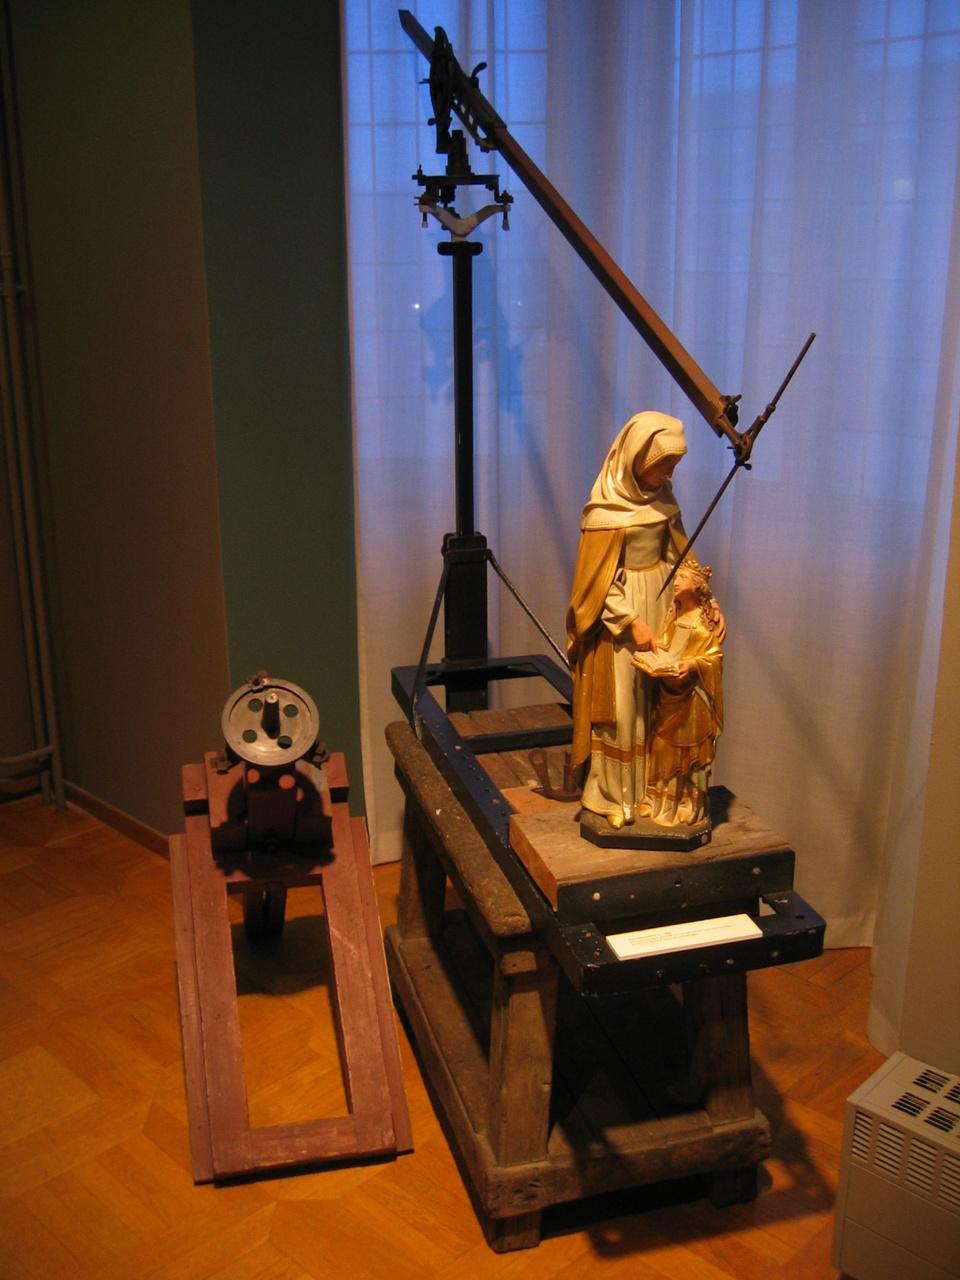 Punteerapparaat, gebruikt in Cuypers' kunstwerkplaatsen